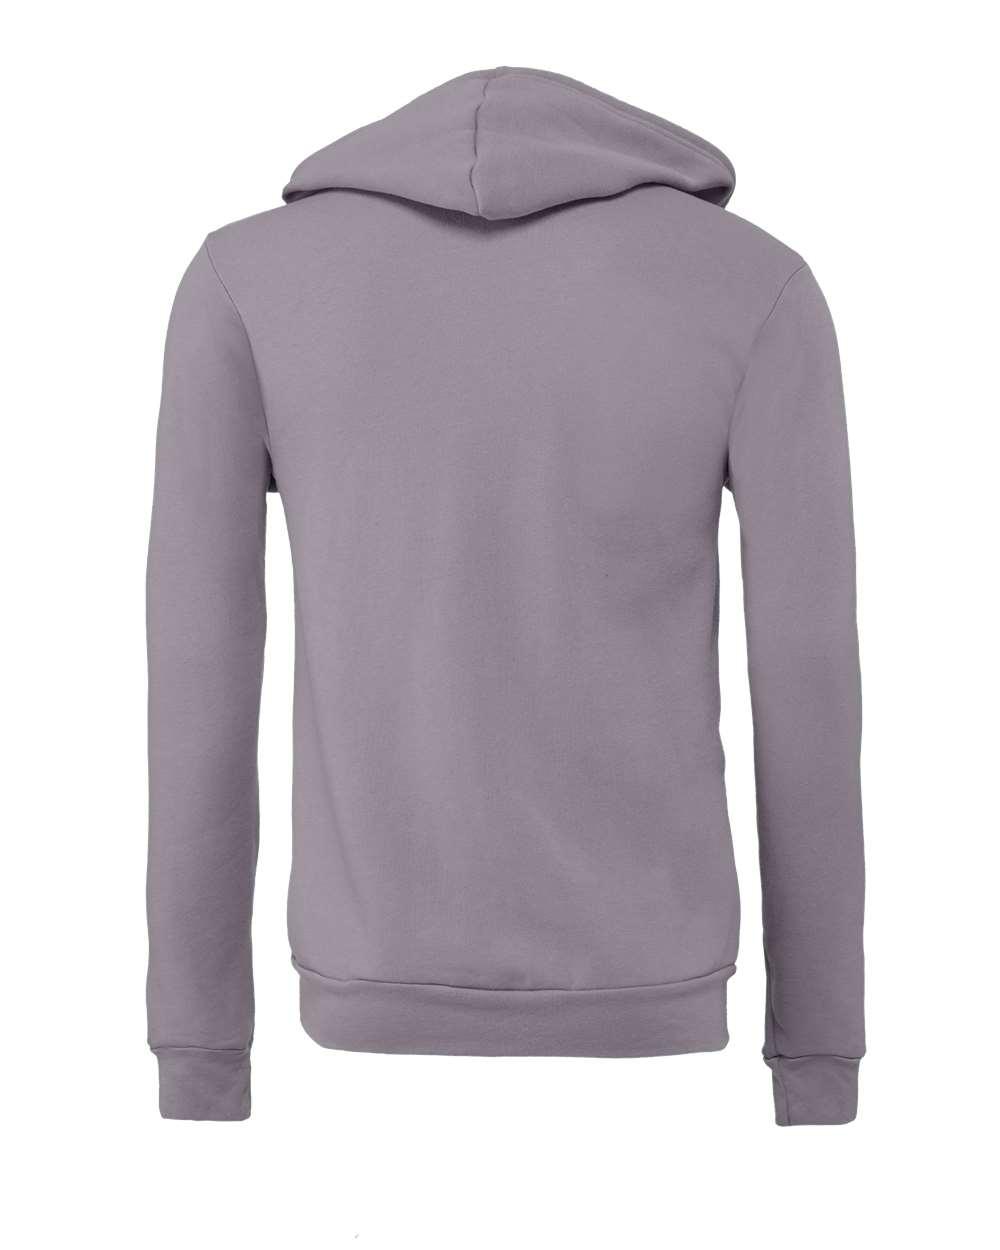 Bella-Canvas-Unisex-Full-Zip-Up-Hooded-Sweatshirt-Blank-Hoodie-3739-up-to-3XL thumbnail 81